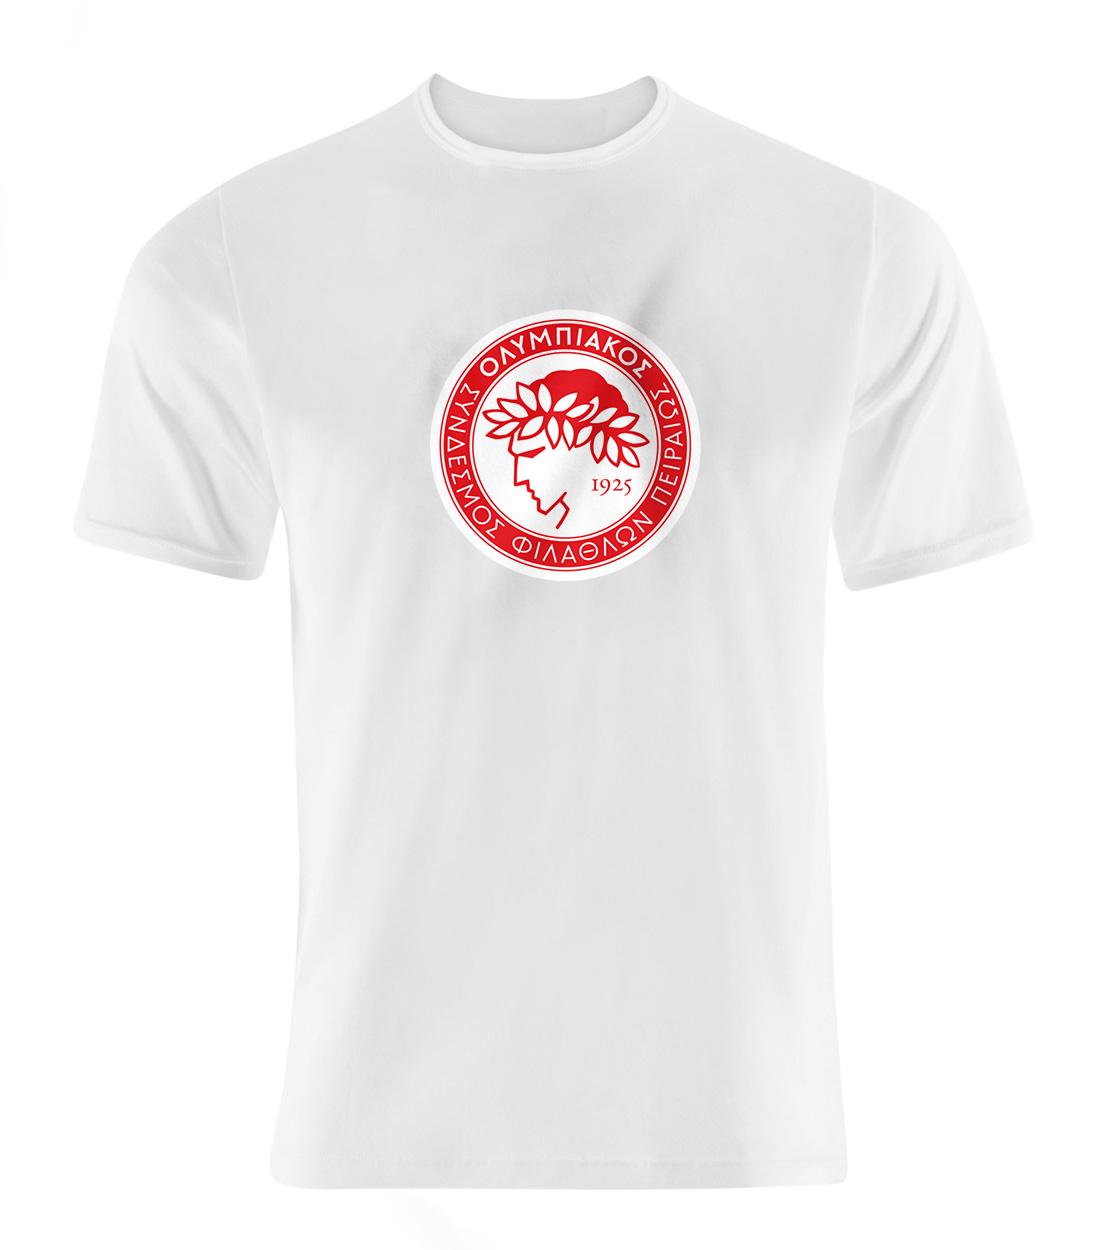 Euroleague Olympiakos Tshirt (TSH-wht-SKR-Euroleague-olympiakos01-514)